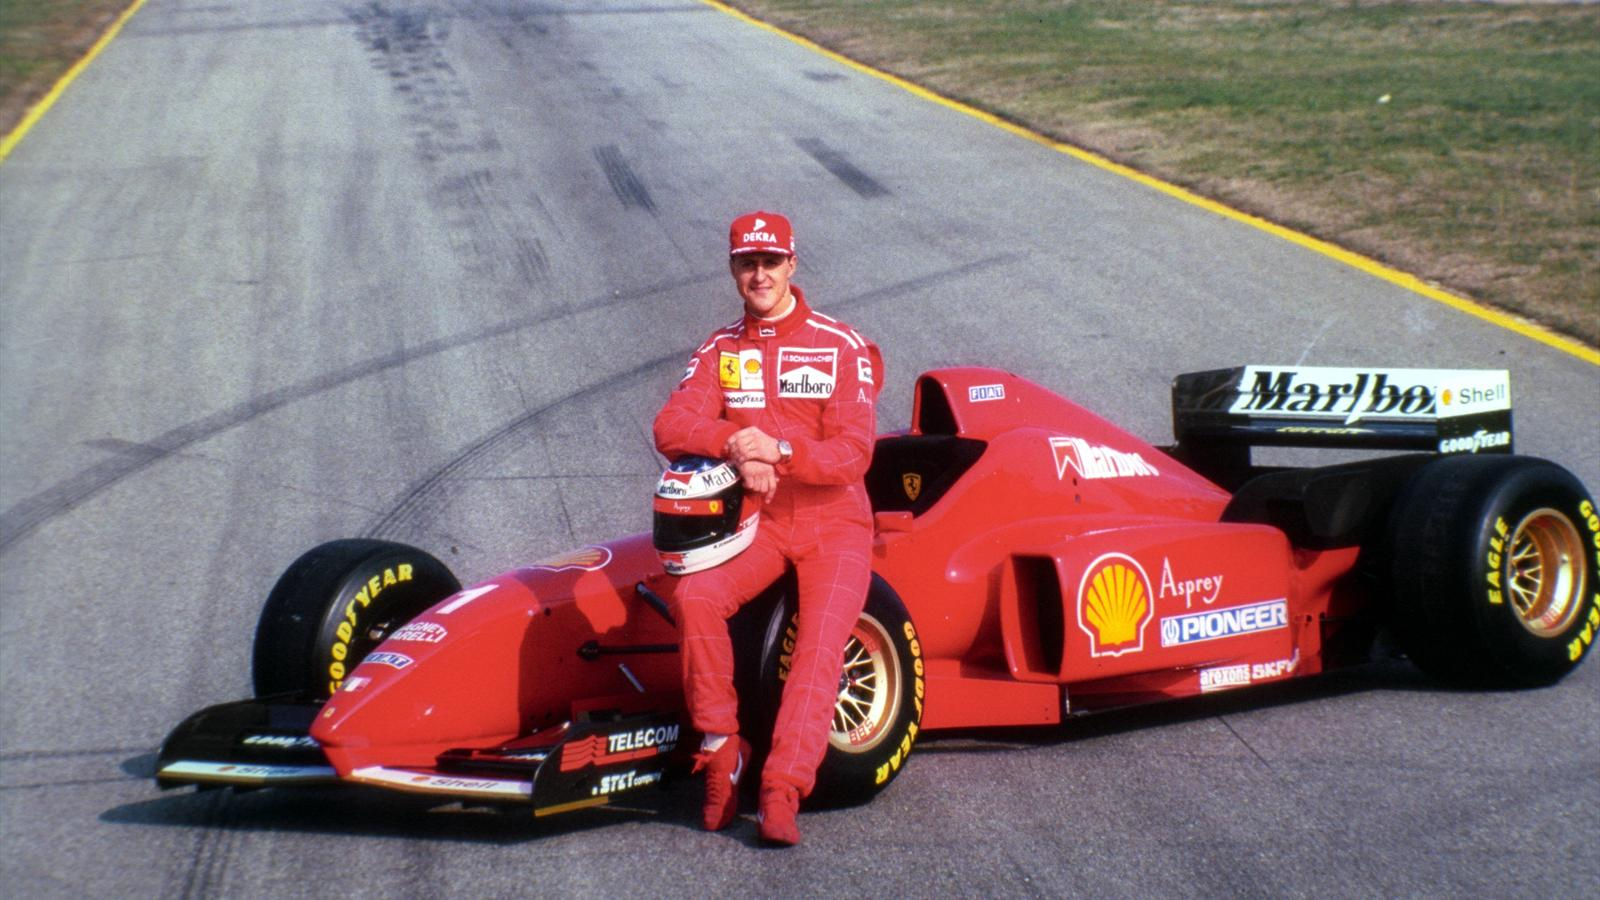 Michael Schumacher - Player Profile - Formula 1 - Eurosport British